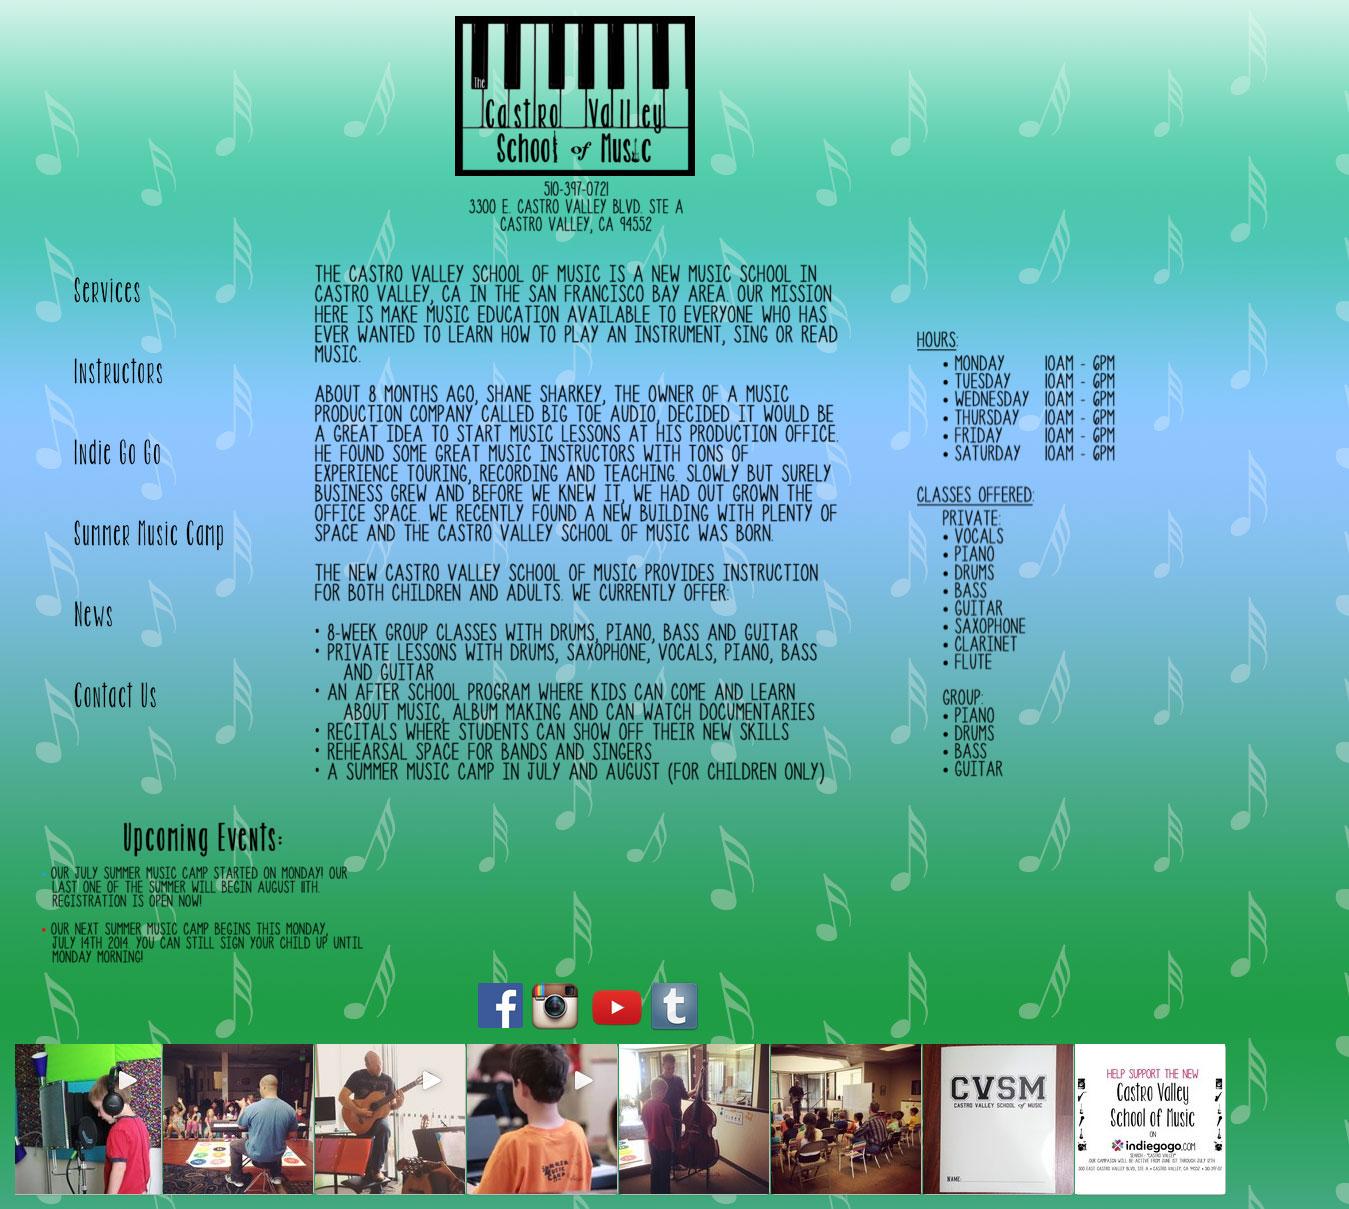 castro-valley-school-of-music-website-old